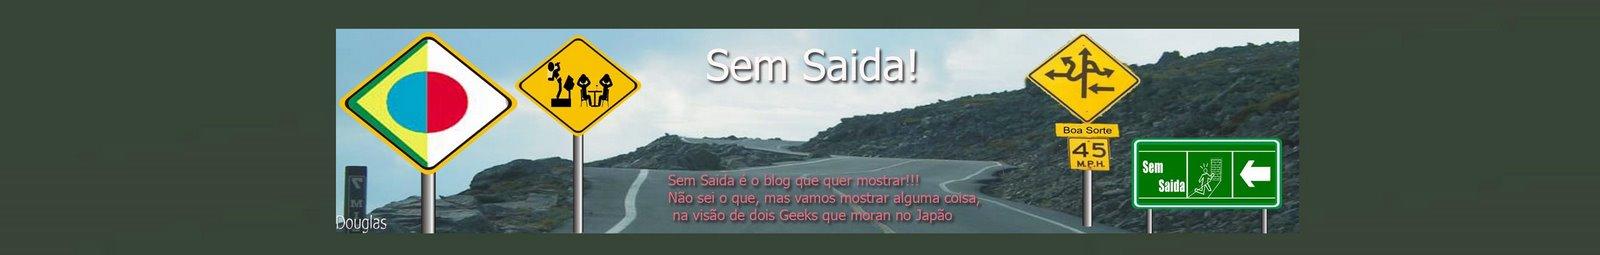 Sem Saida!